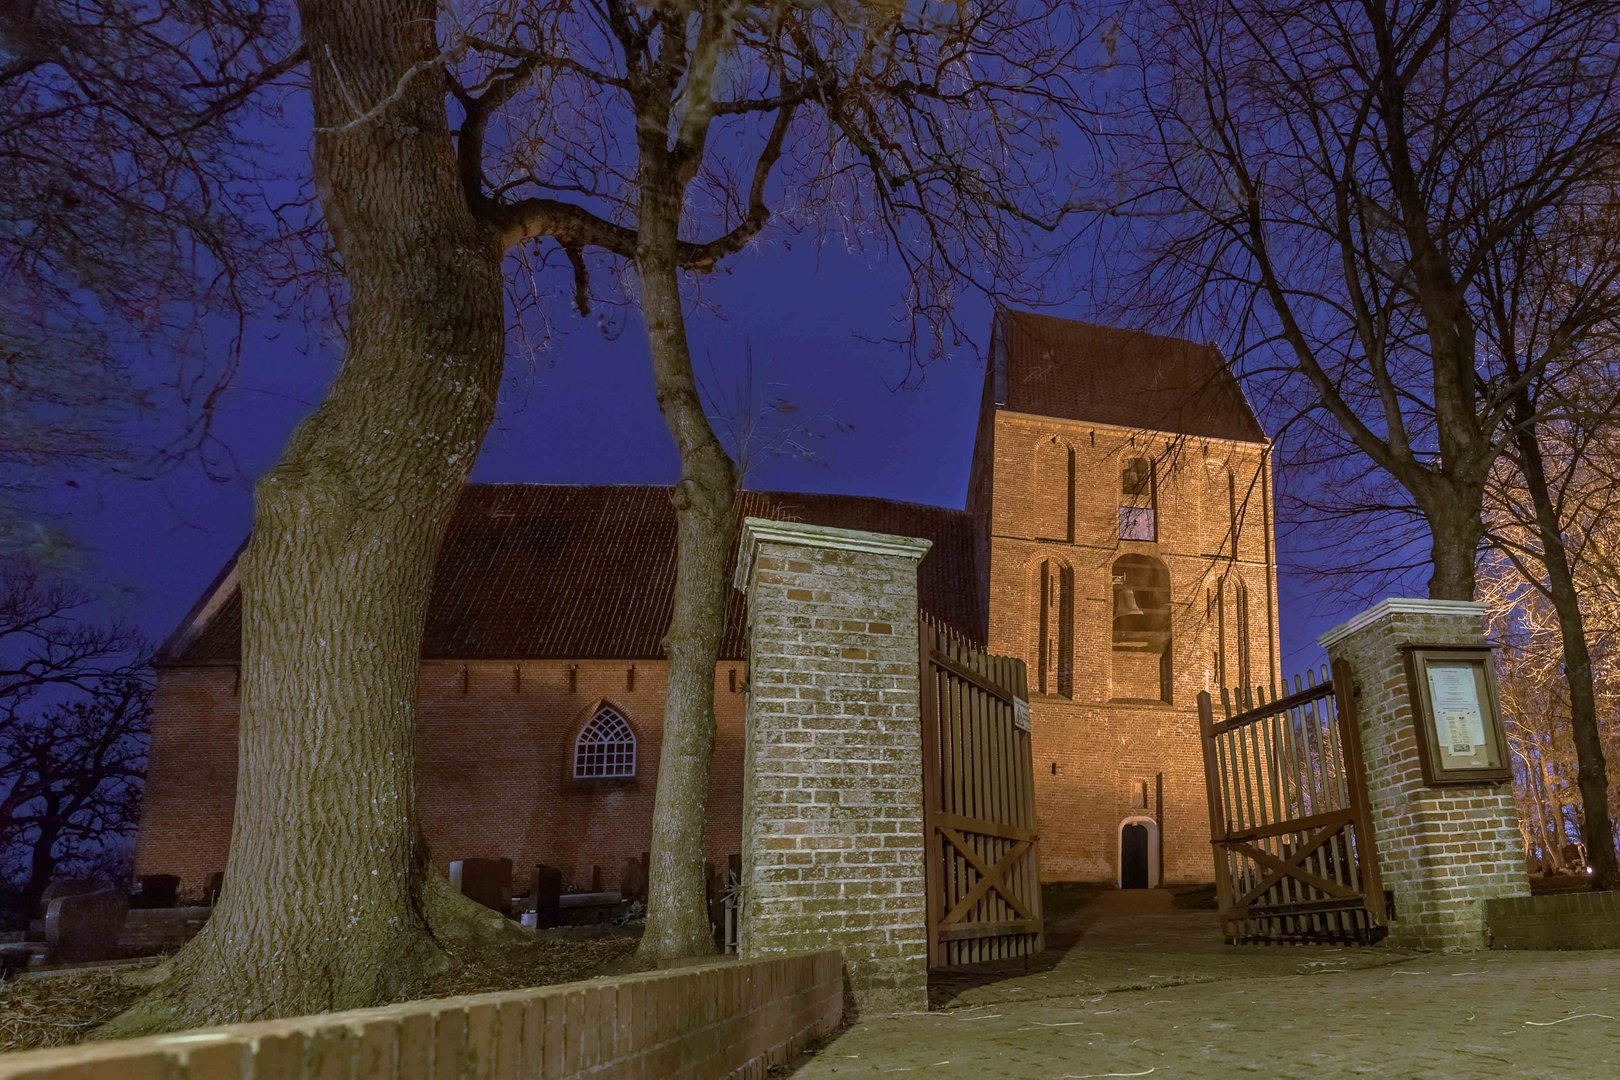 Wer hat den schiefsten Kirchturm? Pisa oder Suurhusen